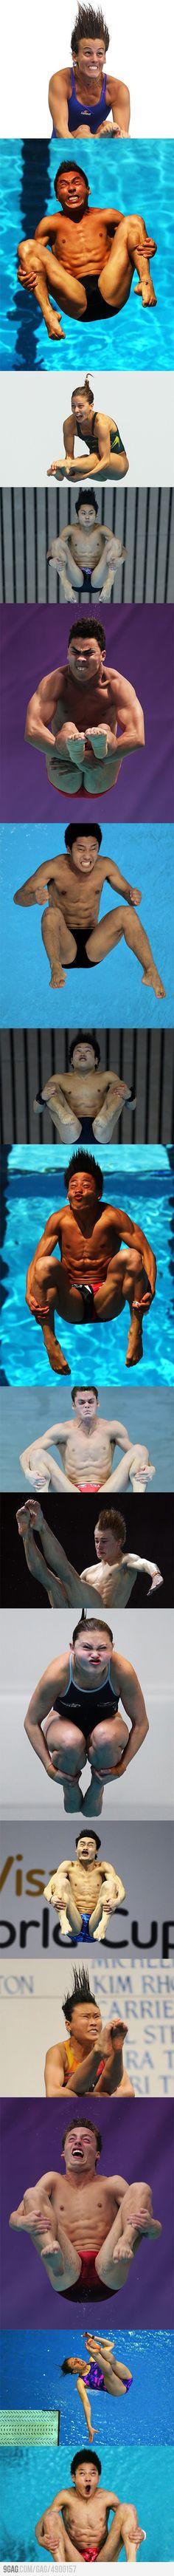 Olympic Divers. hahaha!